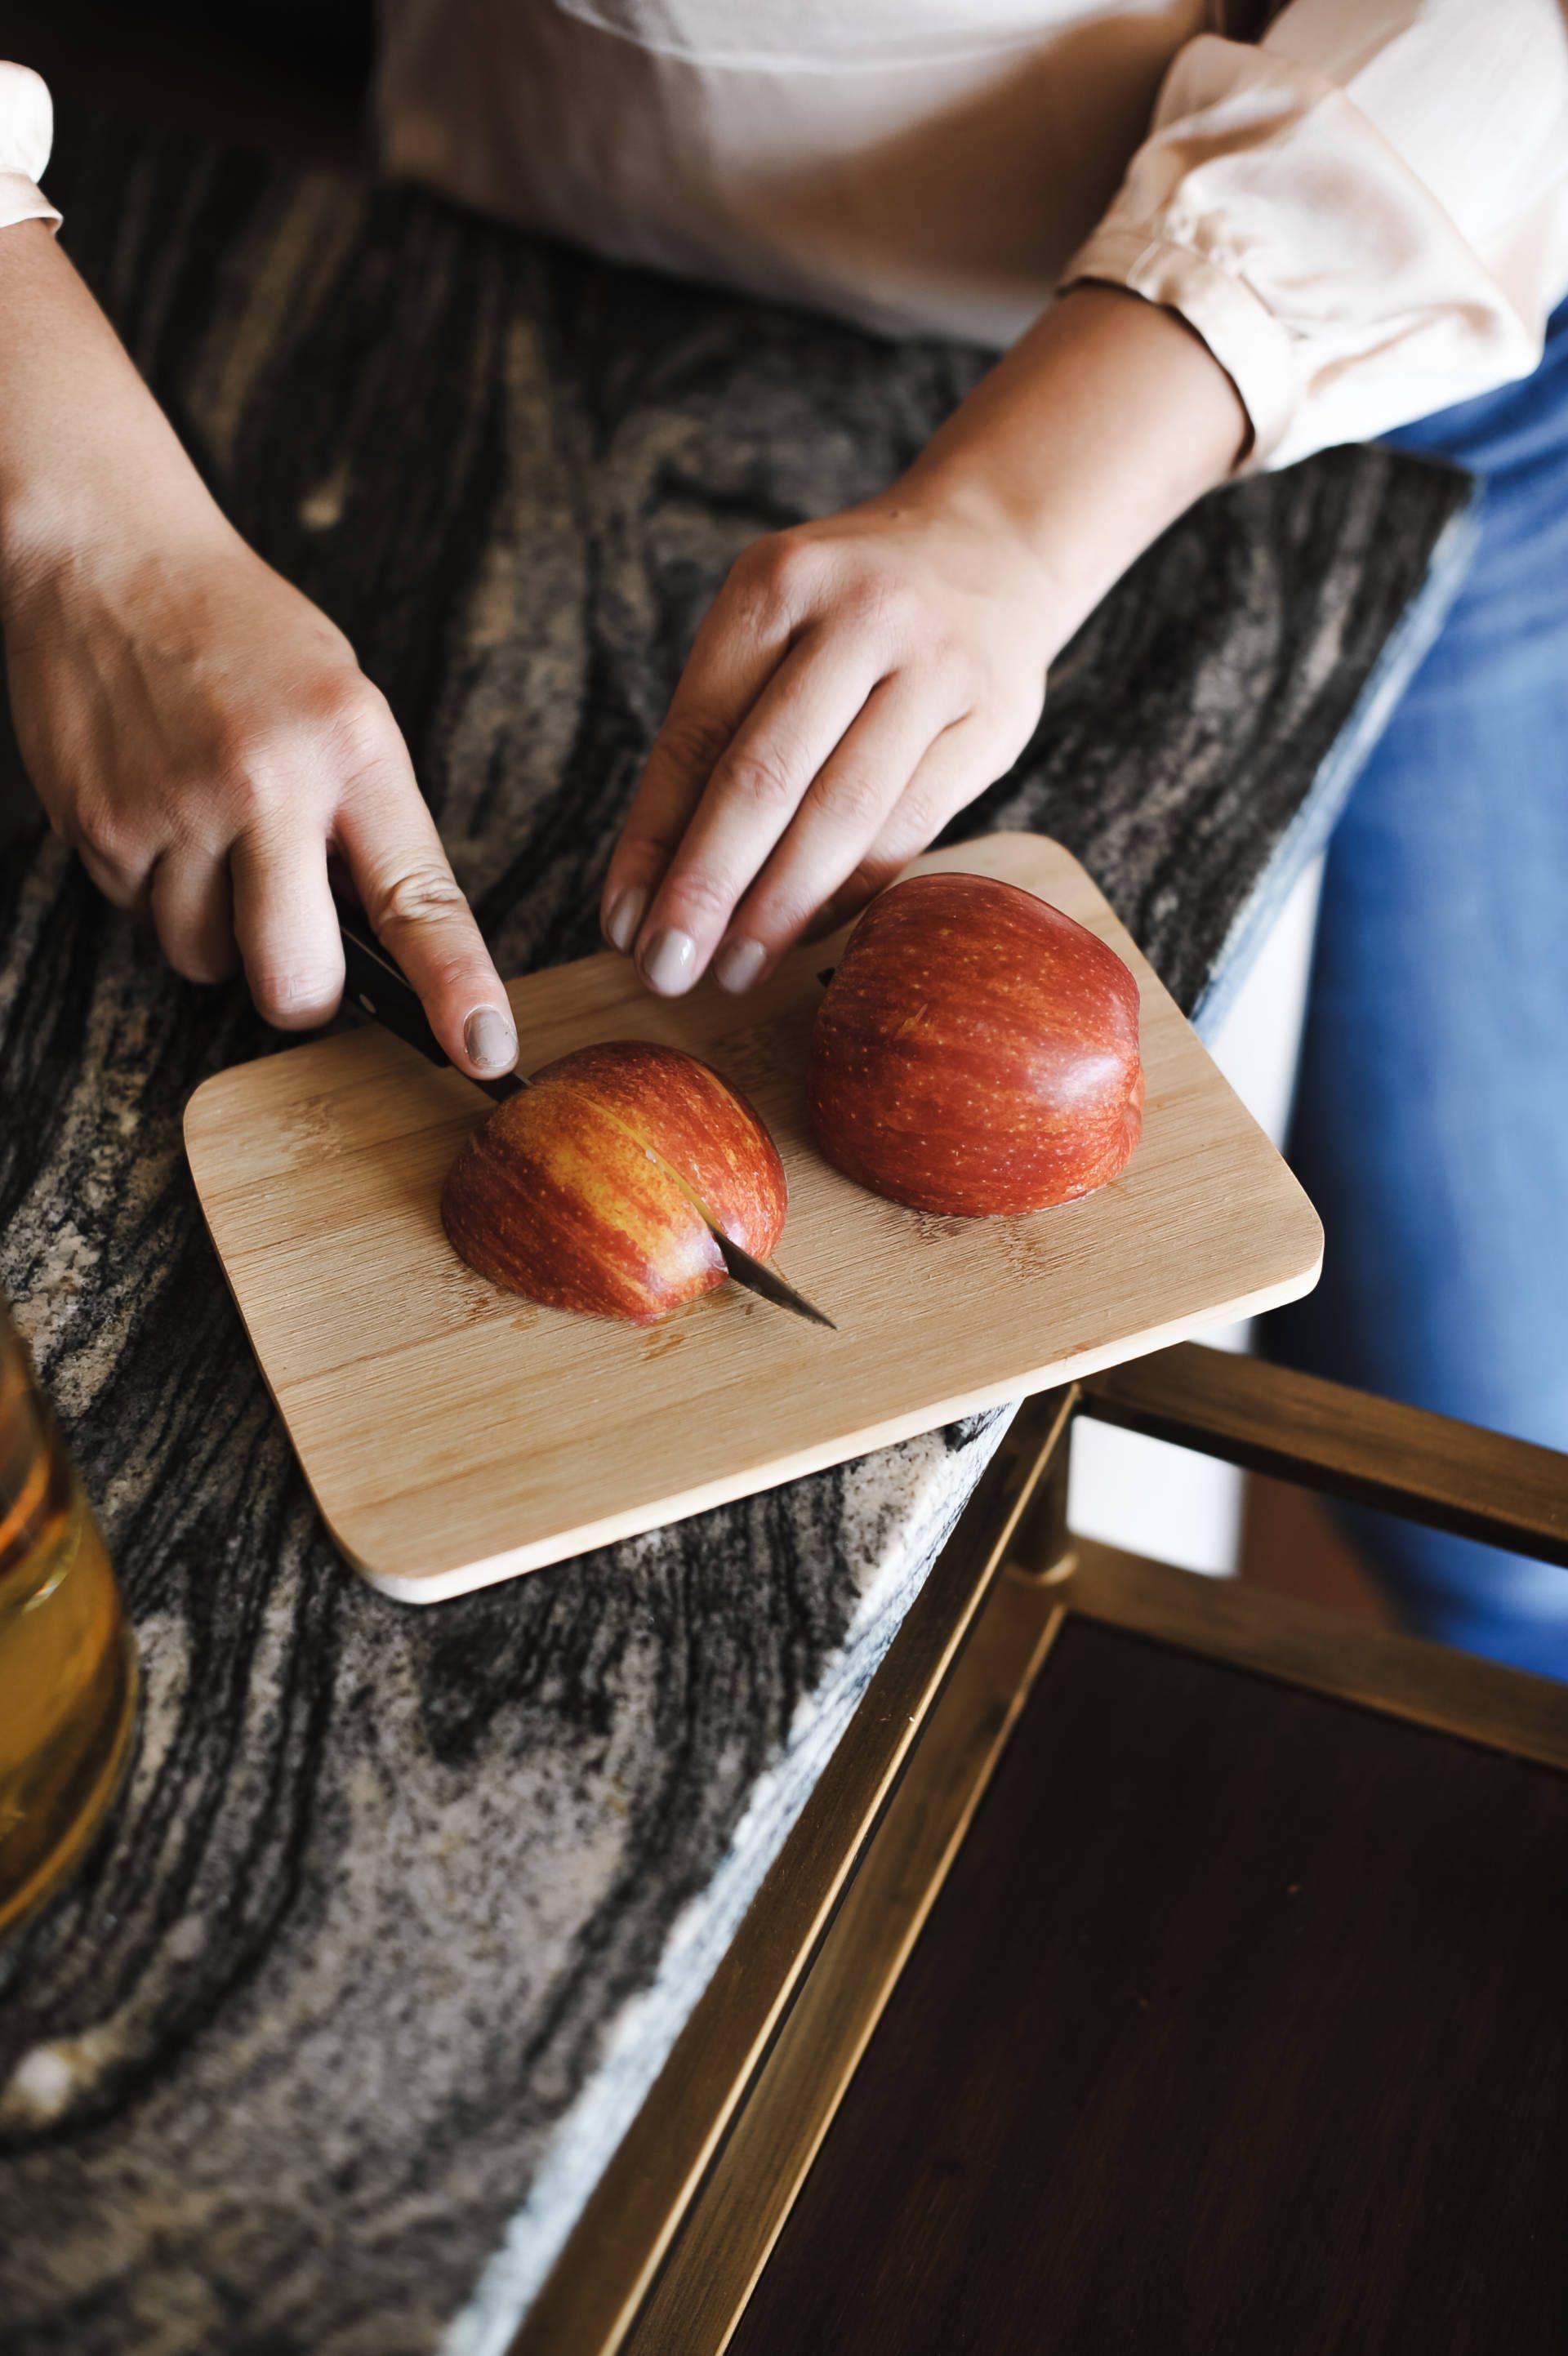 An Easy Apple Cider Sangria Recipe #applecidersangriarecipe